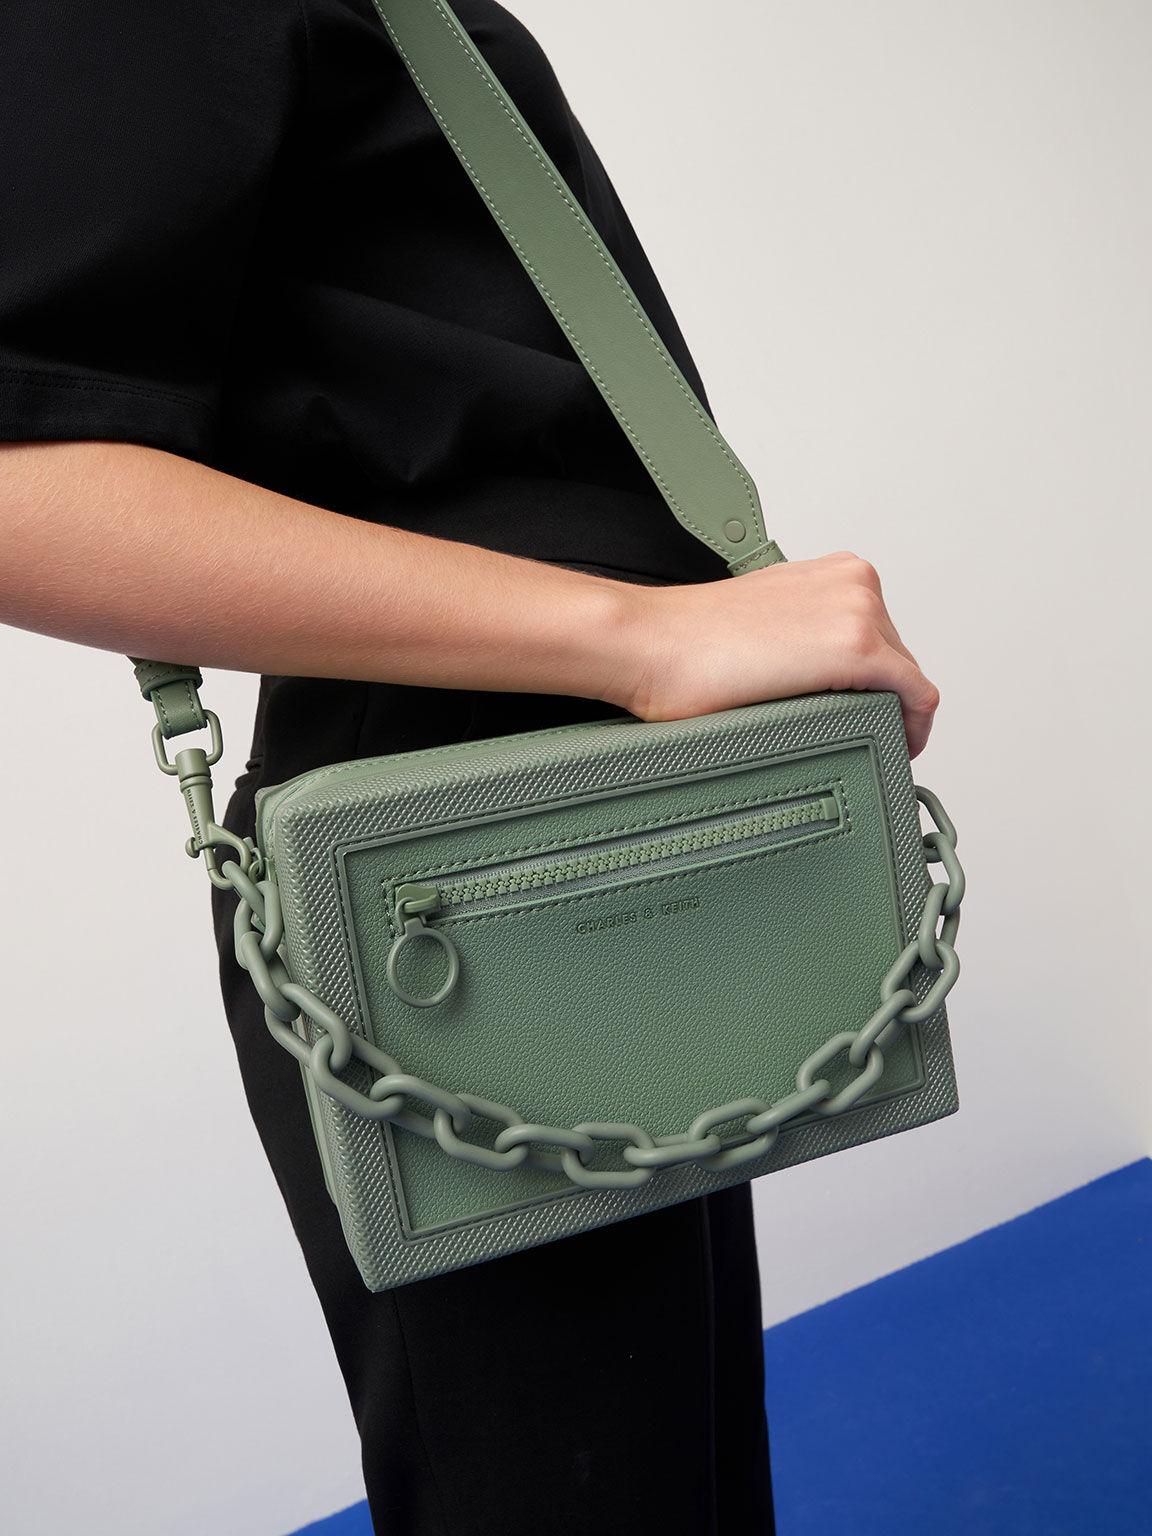 Chain Link Crossbody Bag, Sage Green, hi-res